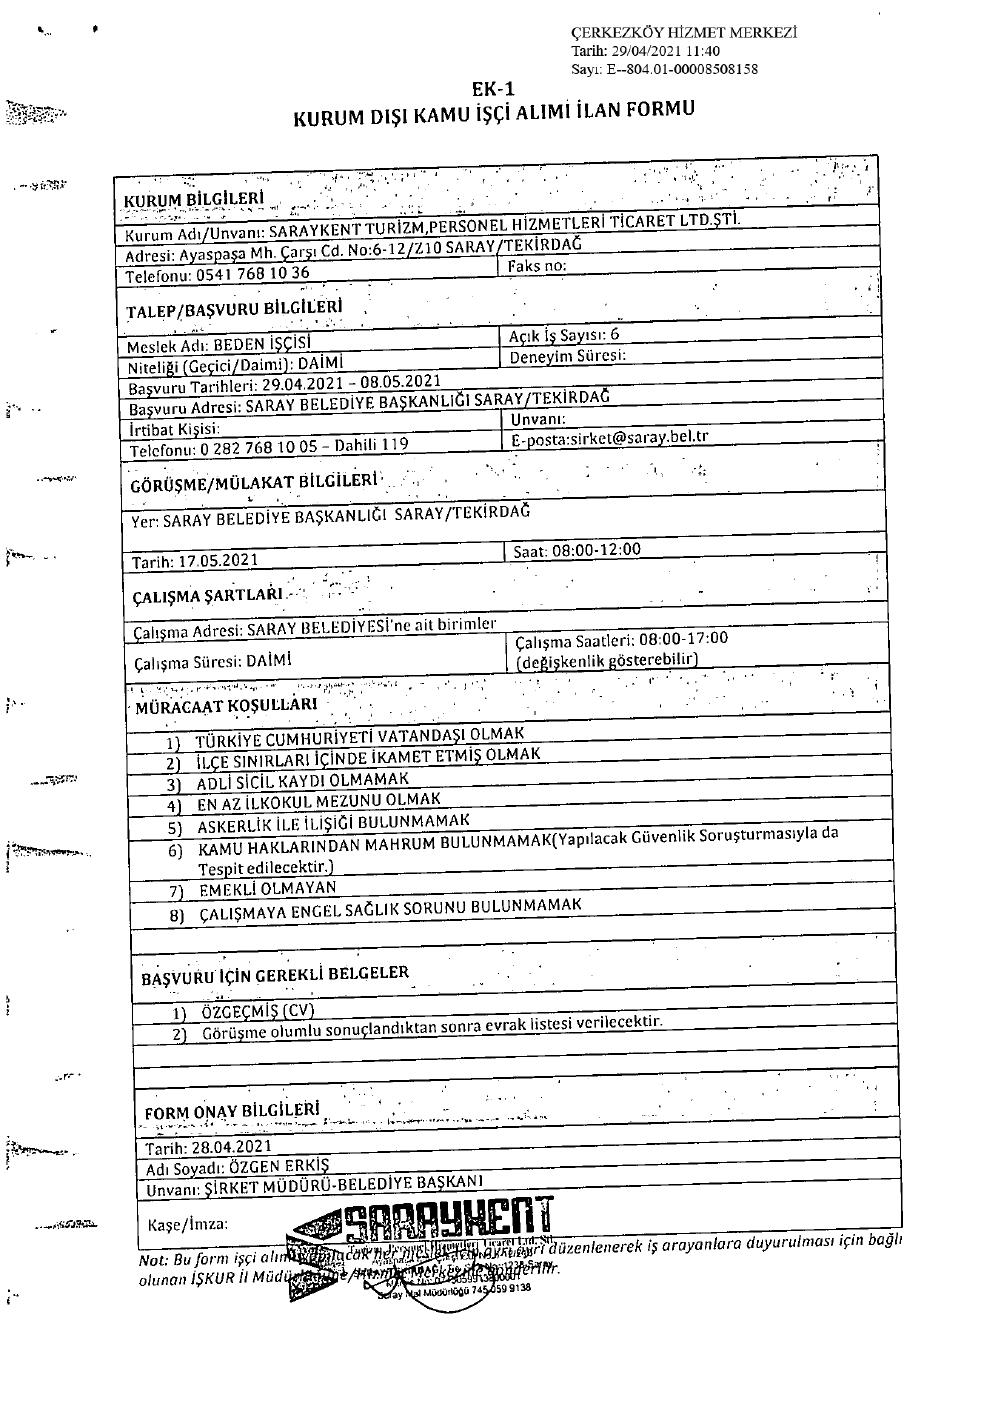 tekirdag-saraykent-turz-per-hizm-tic-ltd-sti-08-05-2021-000001.png